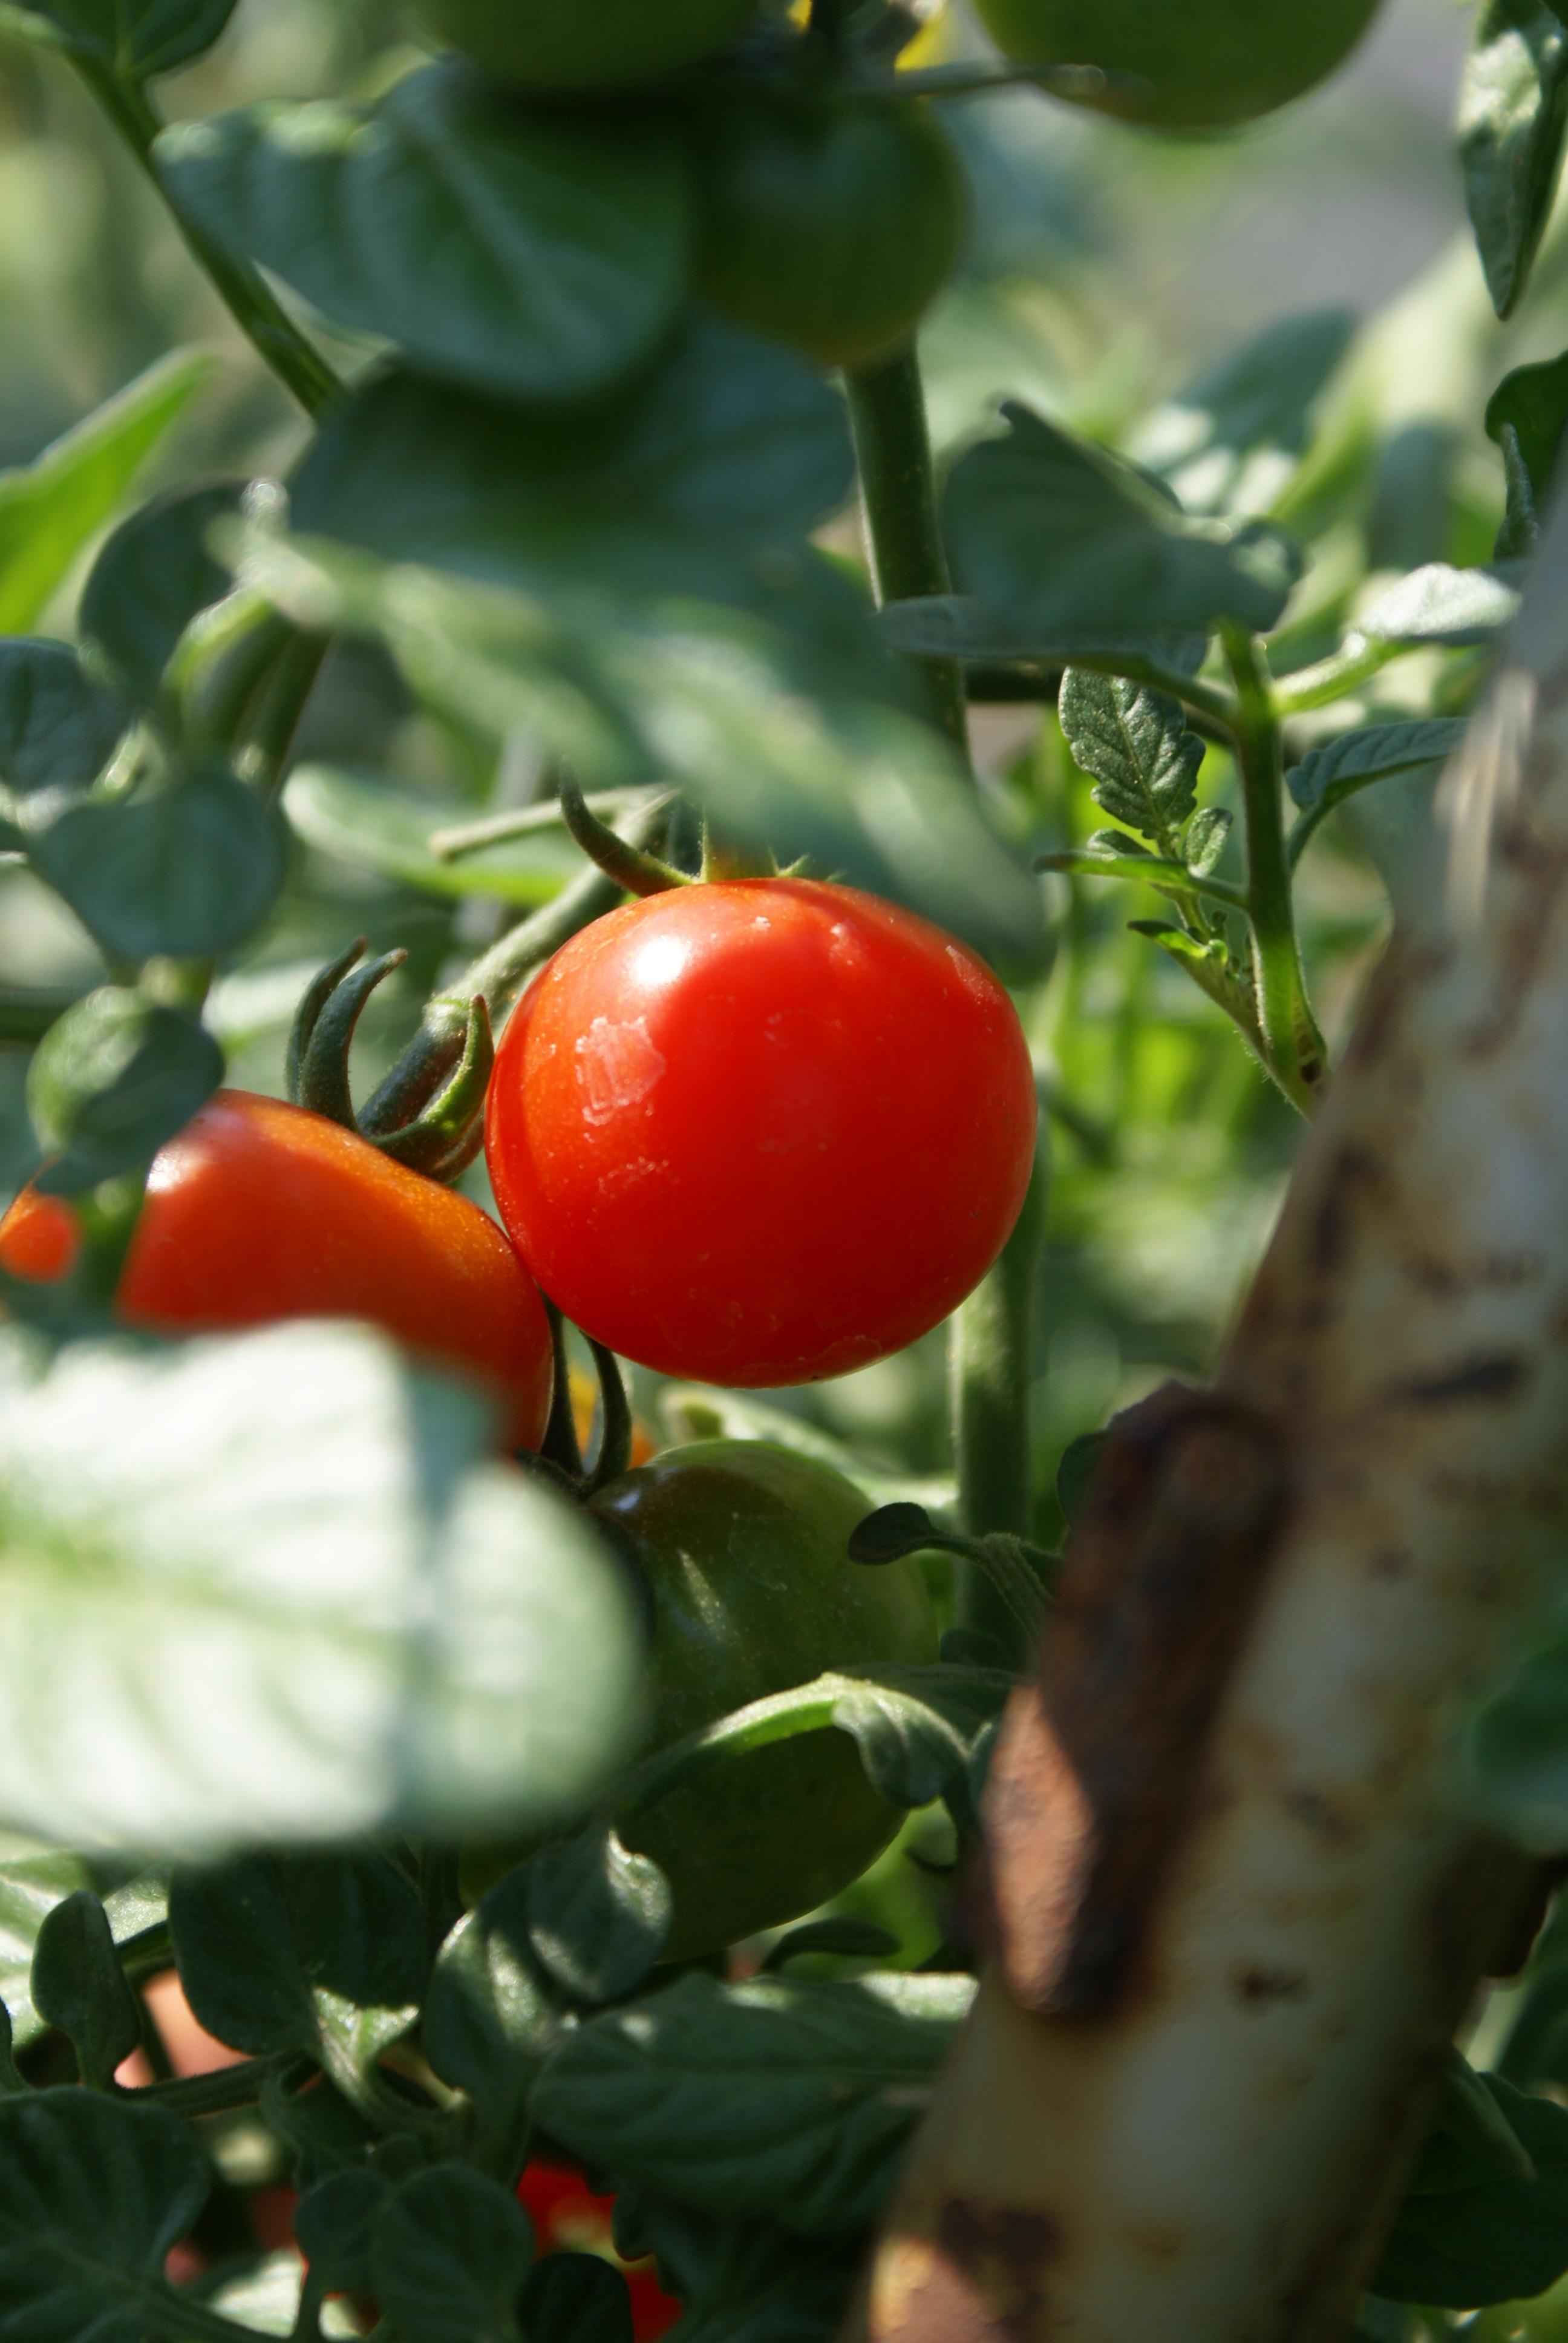 Cherry_Tomato_on_Vine.JPG (2592×3872)